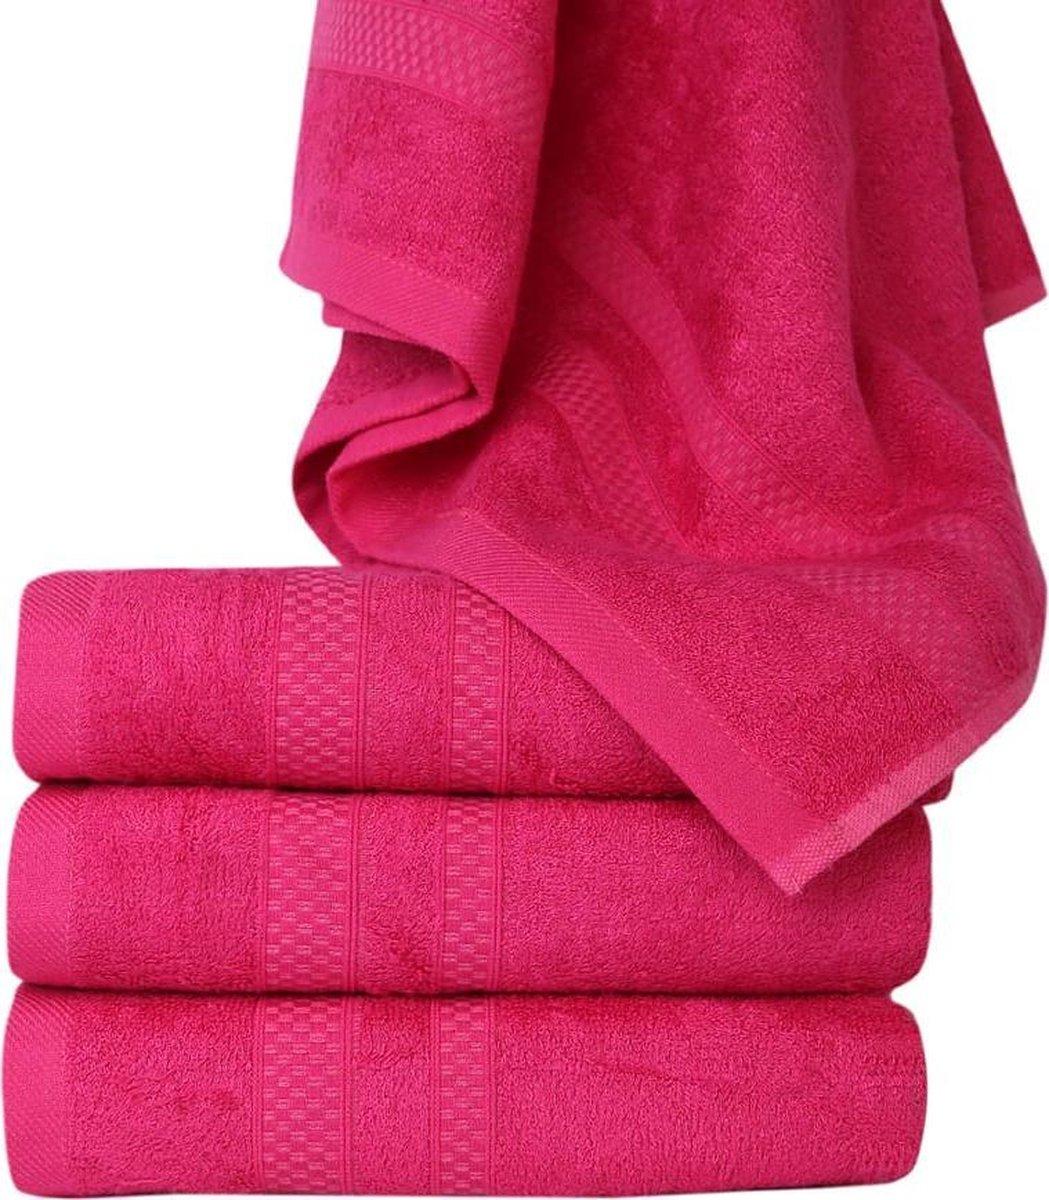 Homéé® Bamboe handdoeken - set van 4 - Fuchsia - 50x90cm